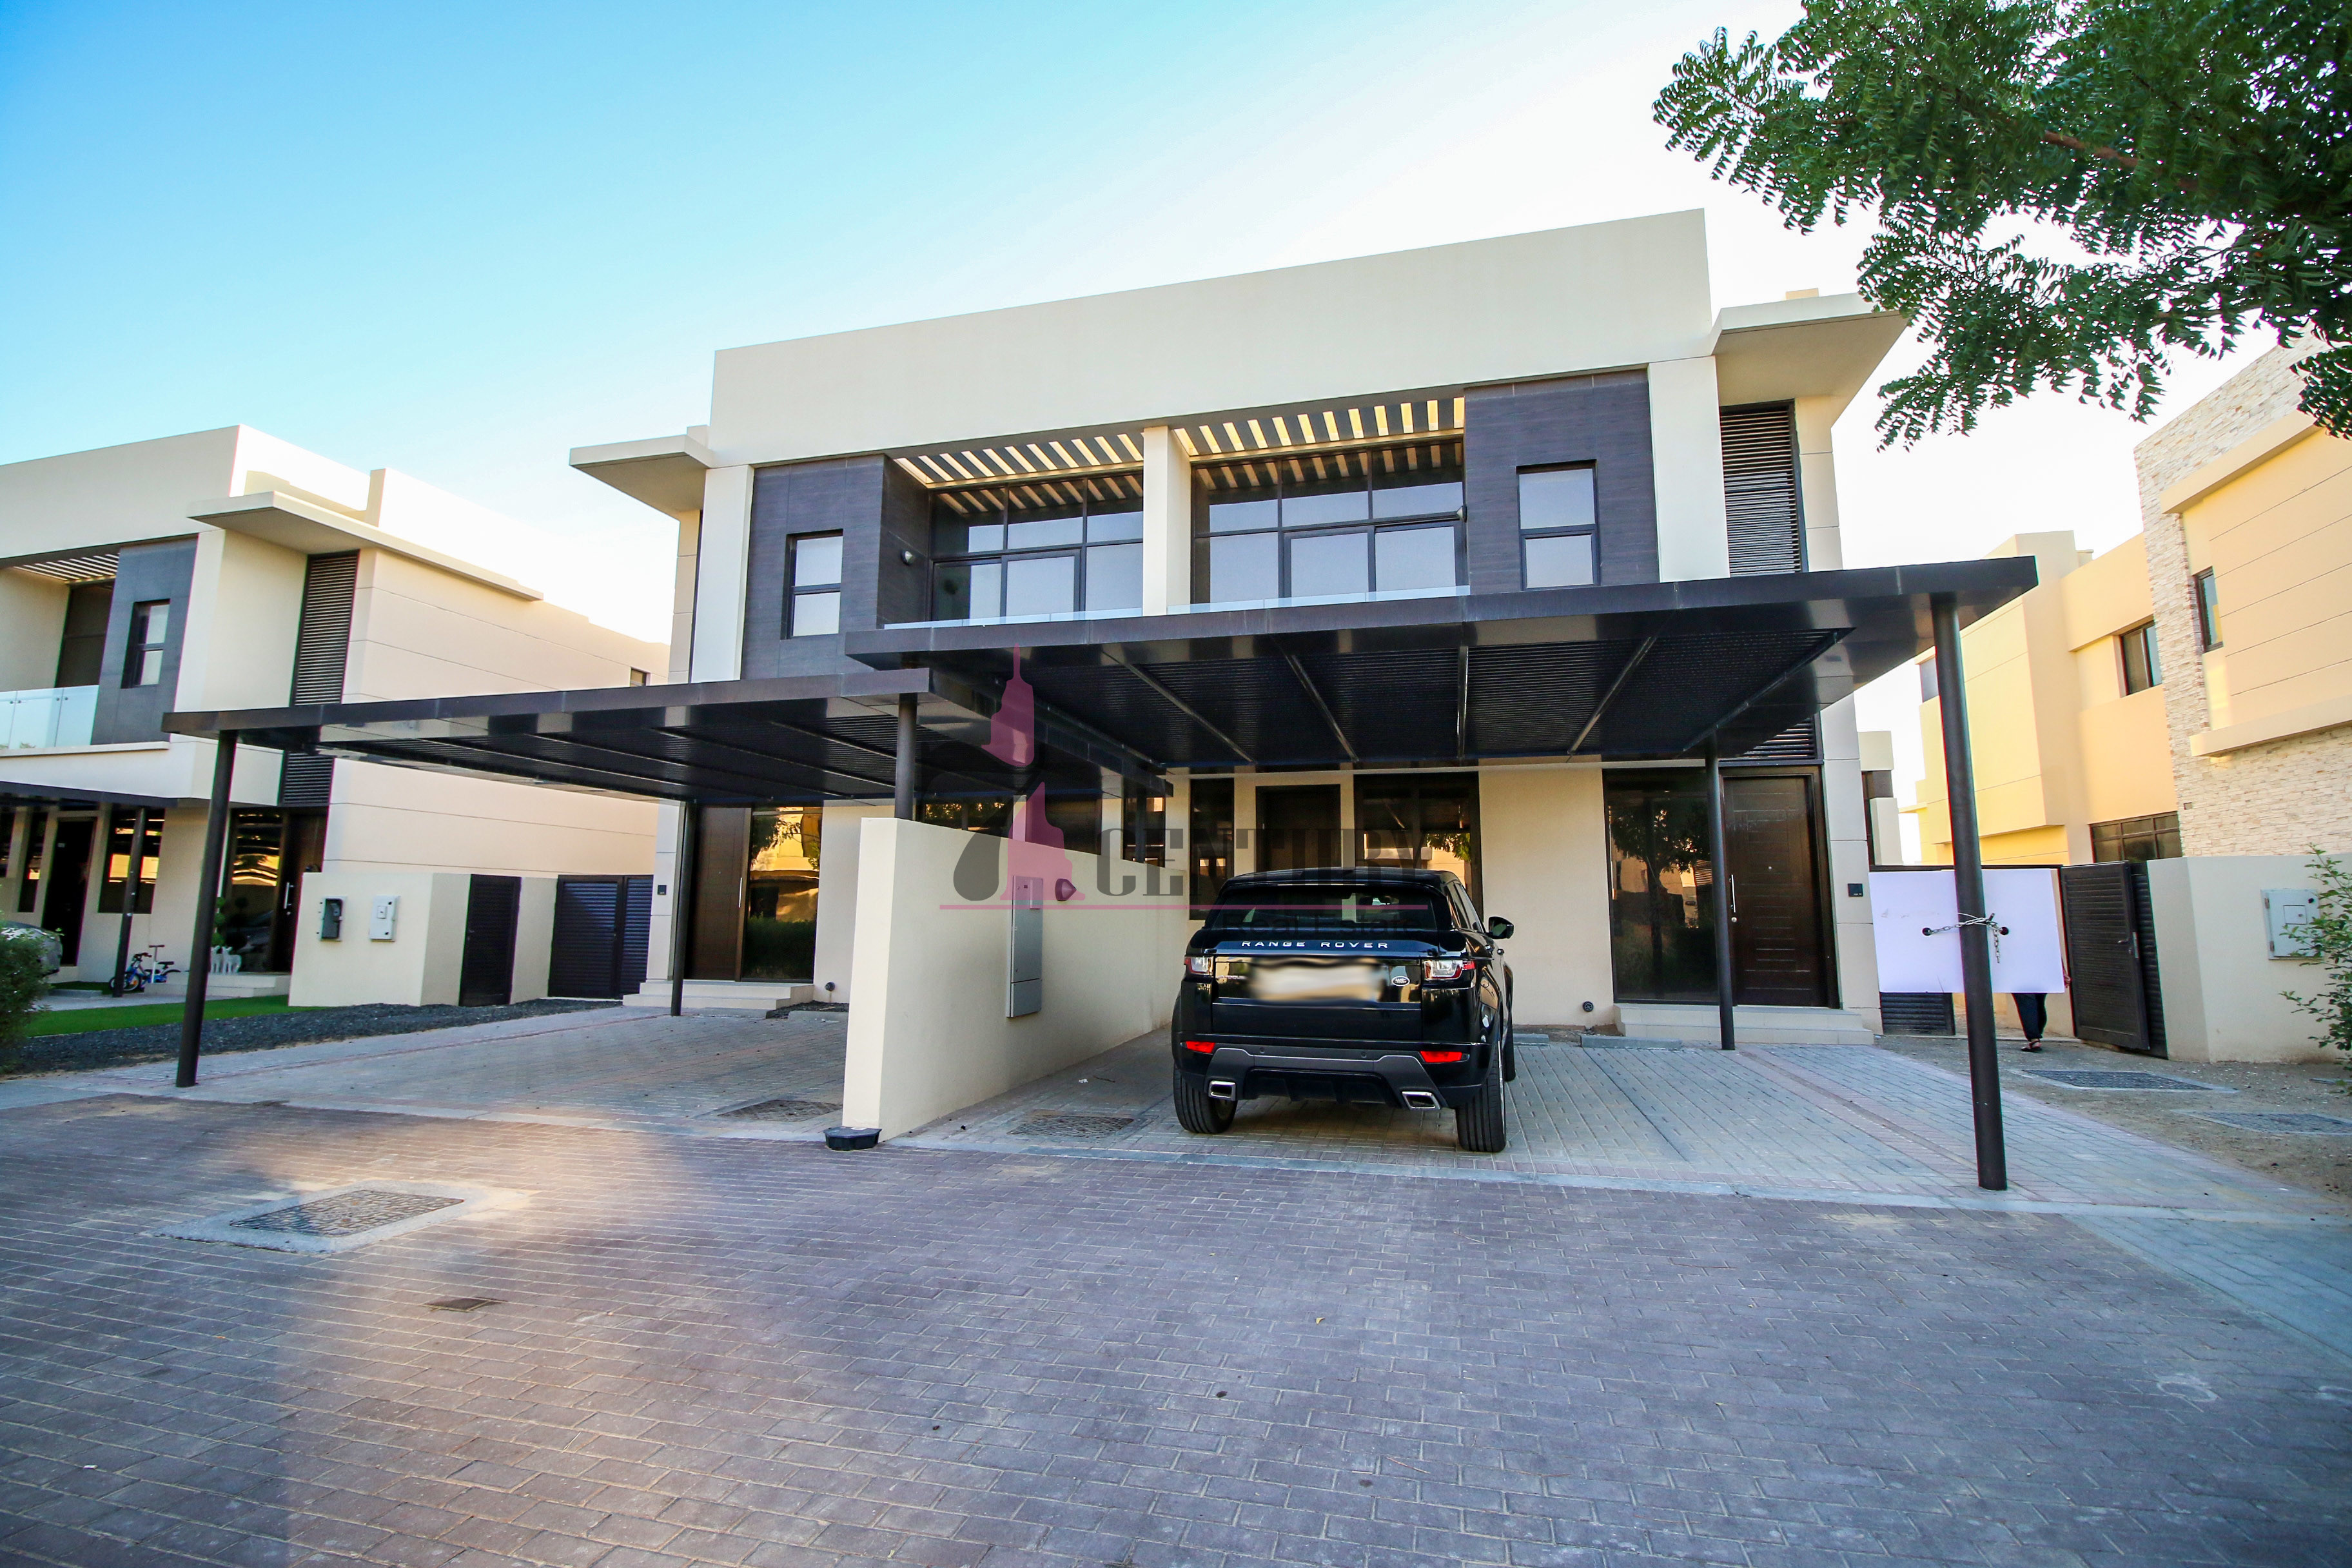 type-th-k-3br-villa-immediate-lease-akoya